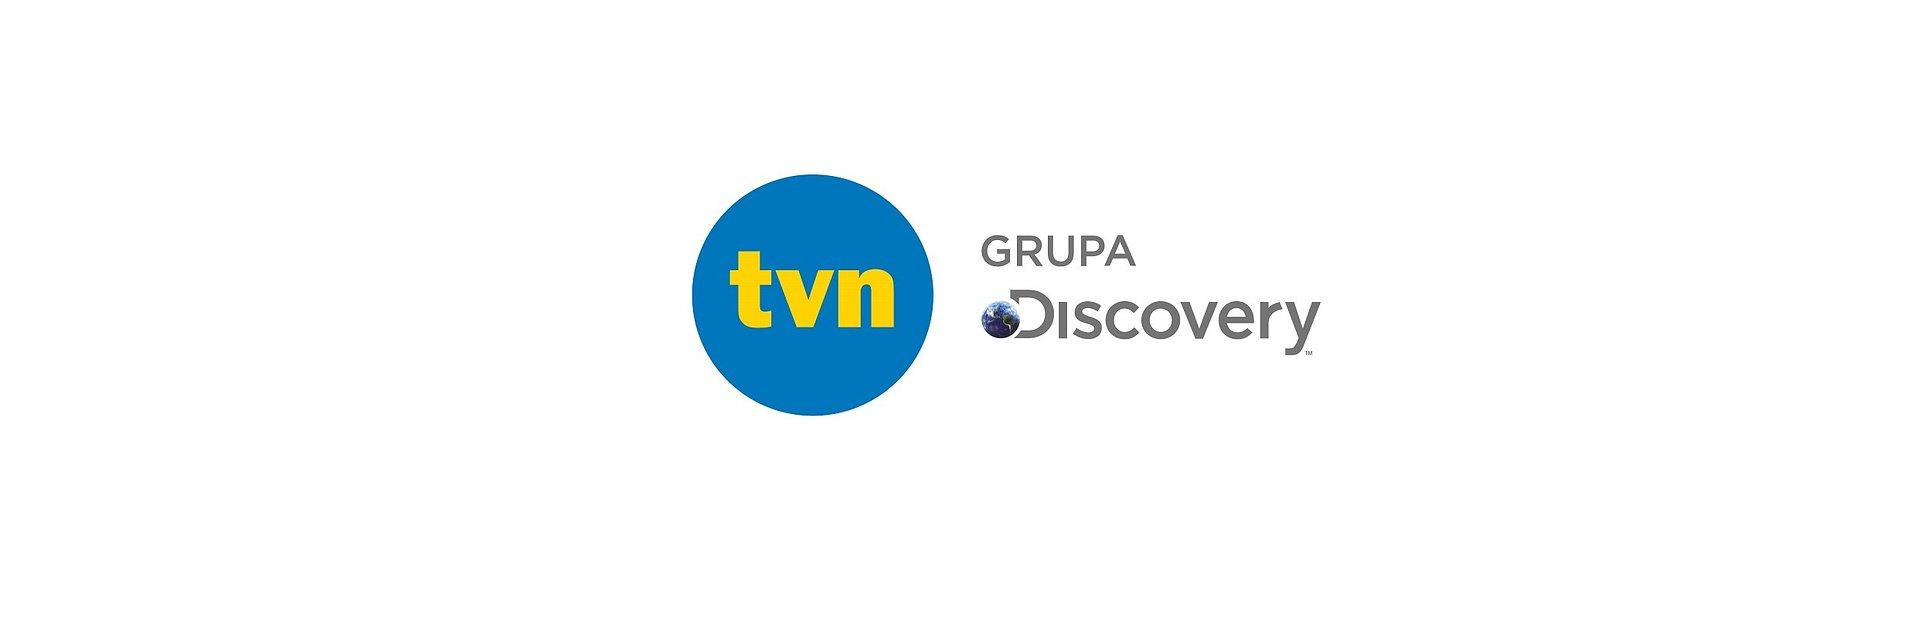 Zmiany w strukturze TVN Grupa Discovery